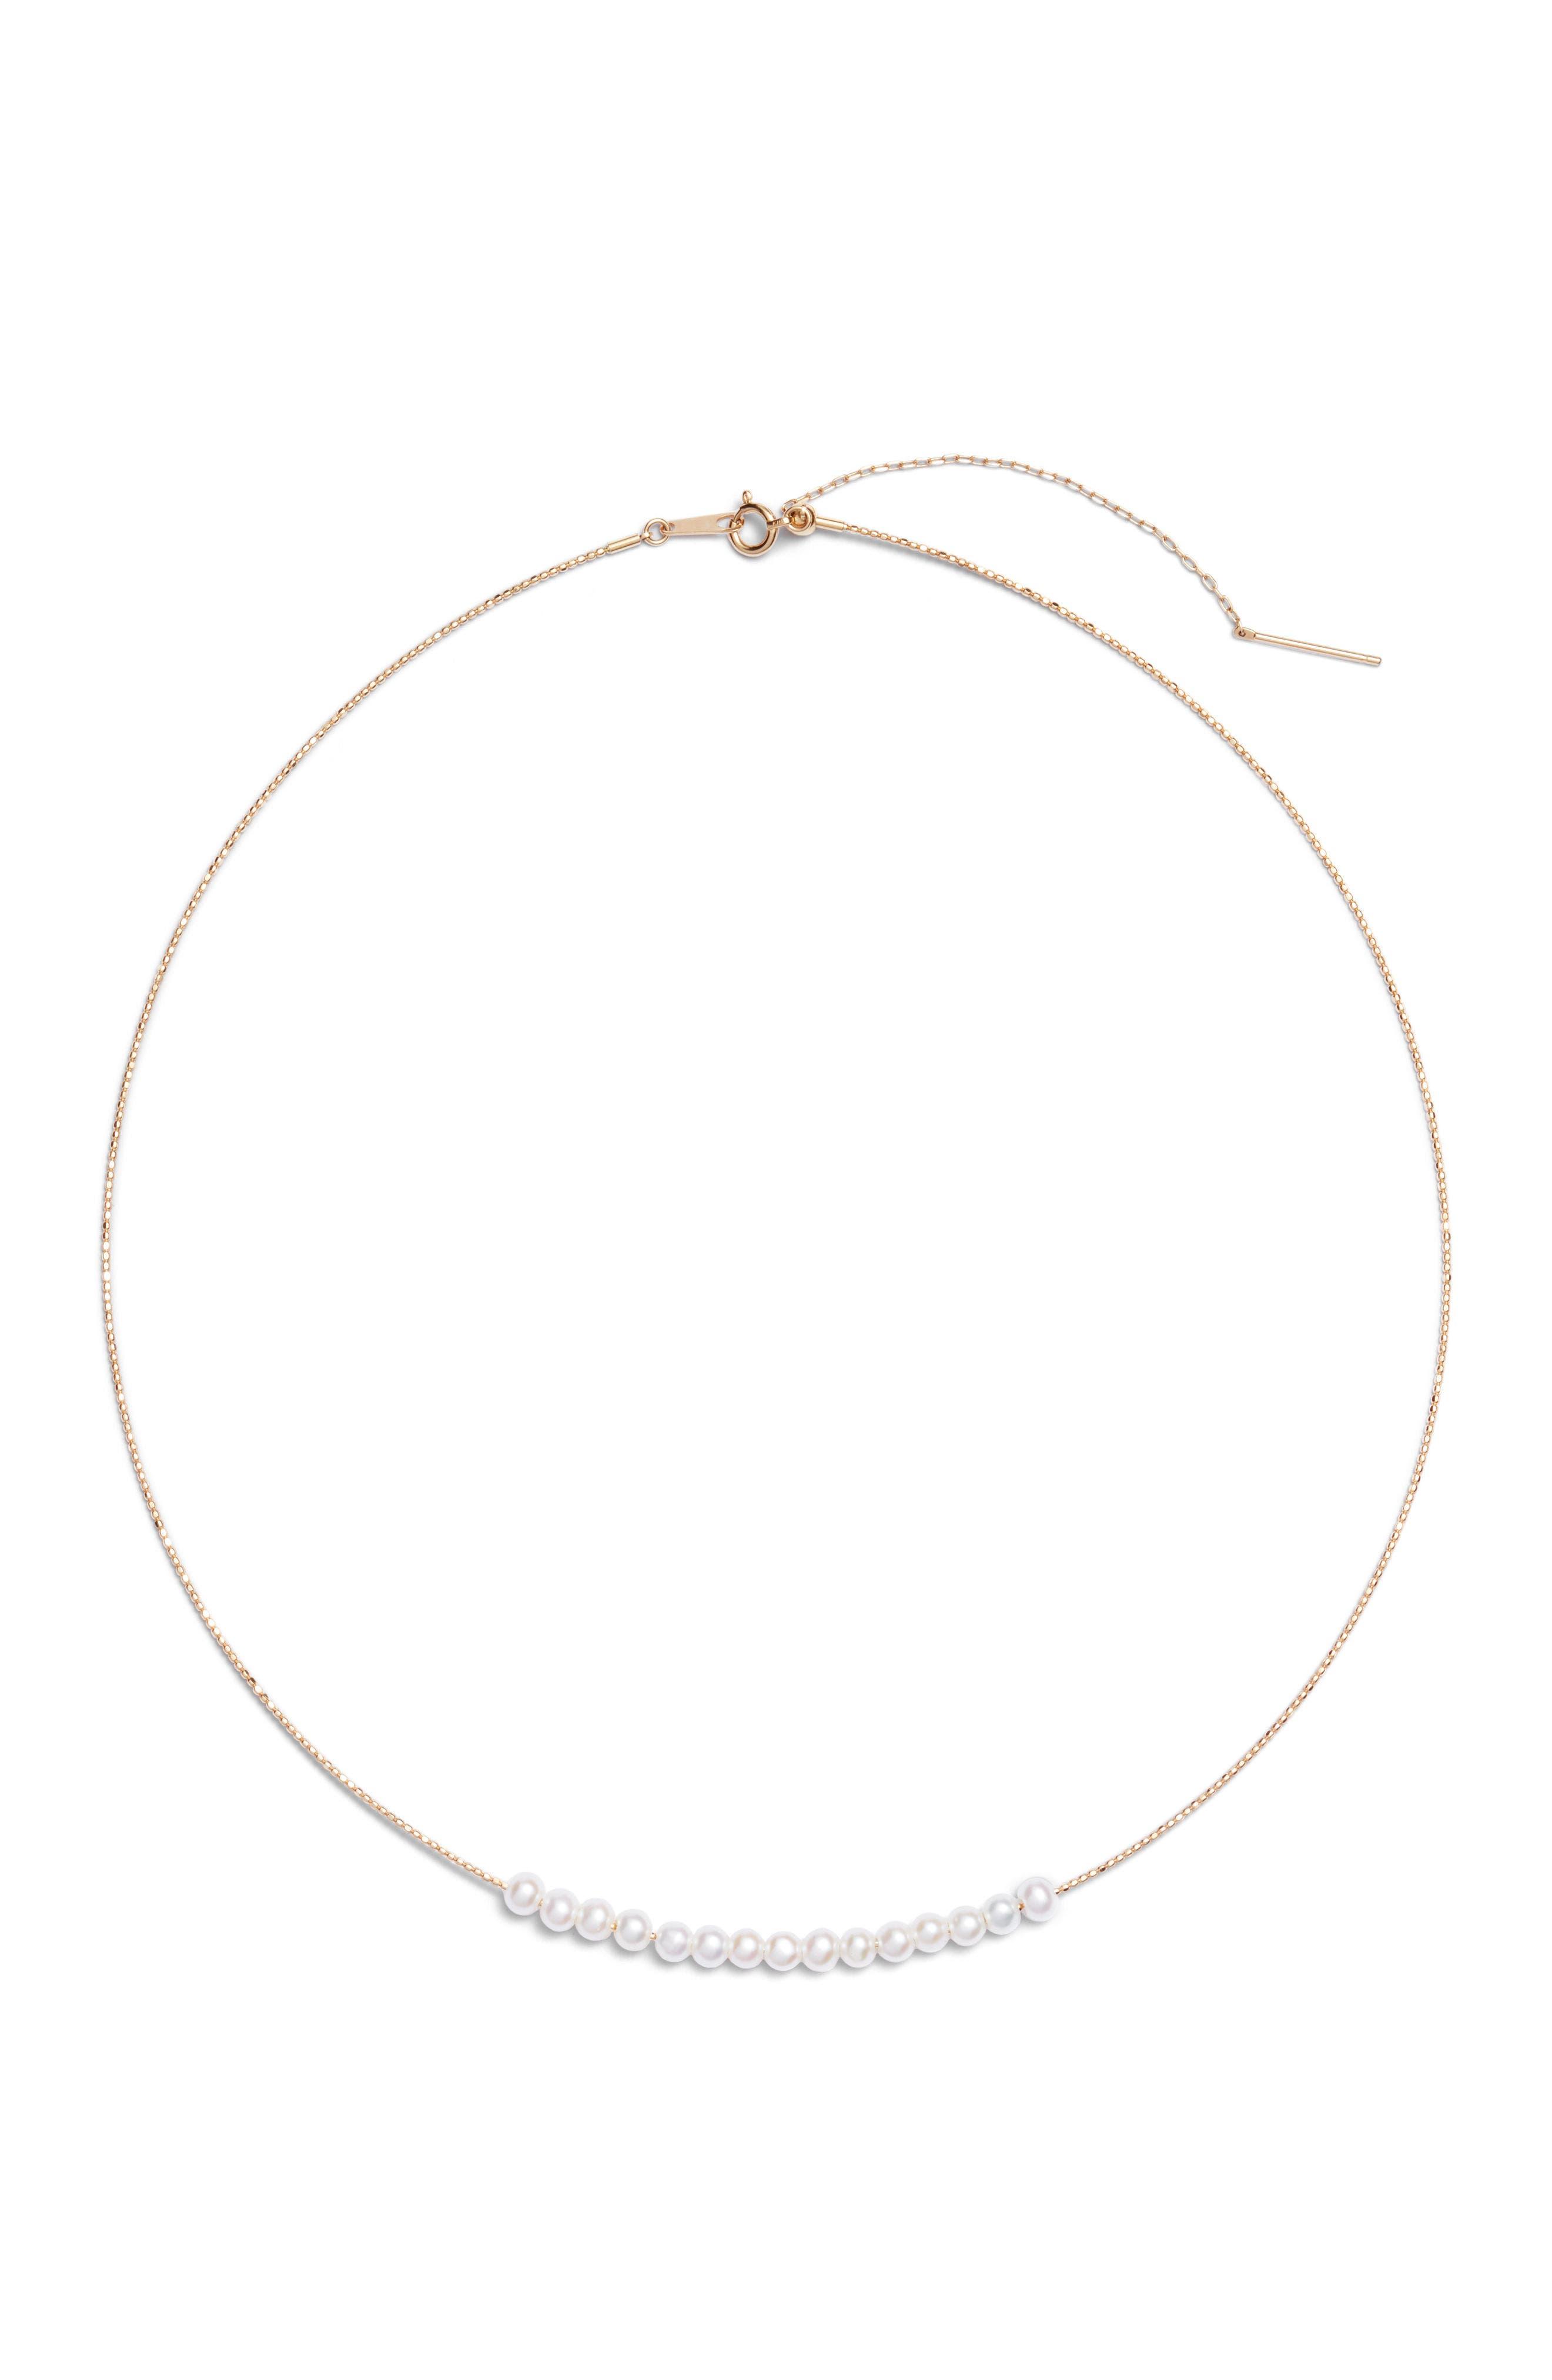 Baby Pearl Skinny Choker Necklace,                             Main thumbnail 1, color,                             YELLOW GOLD/ PEARL